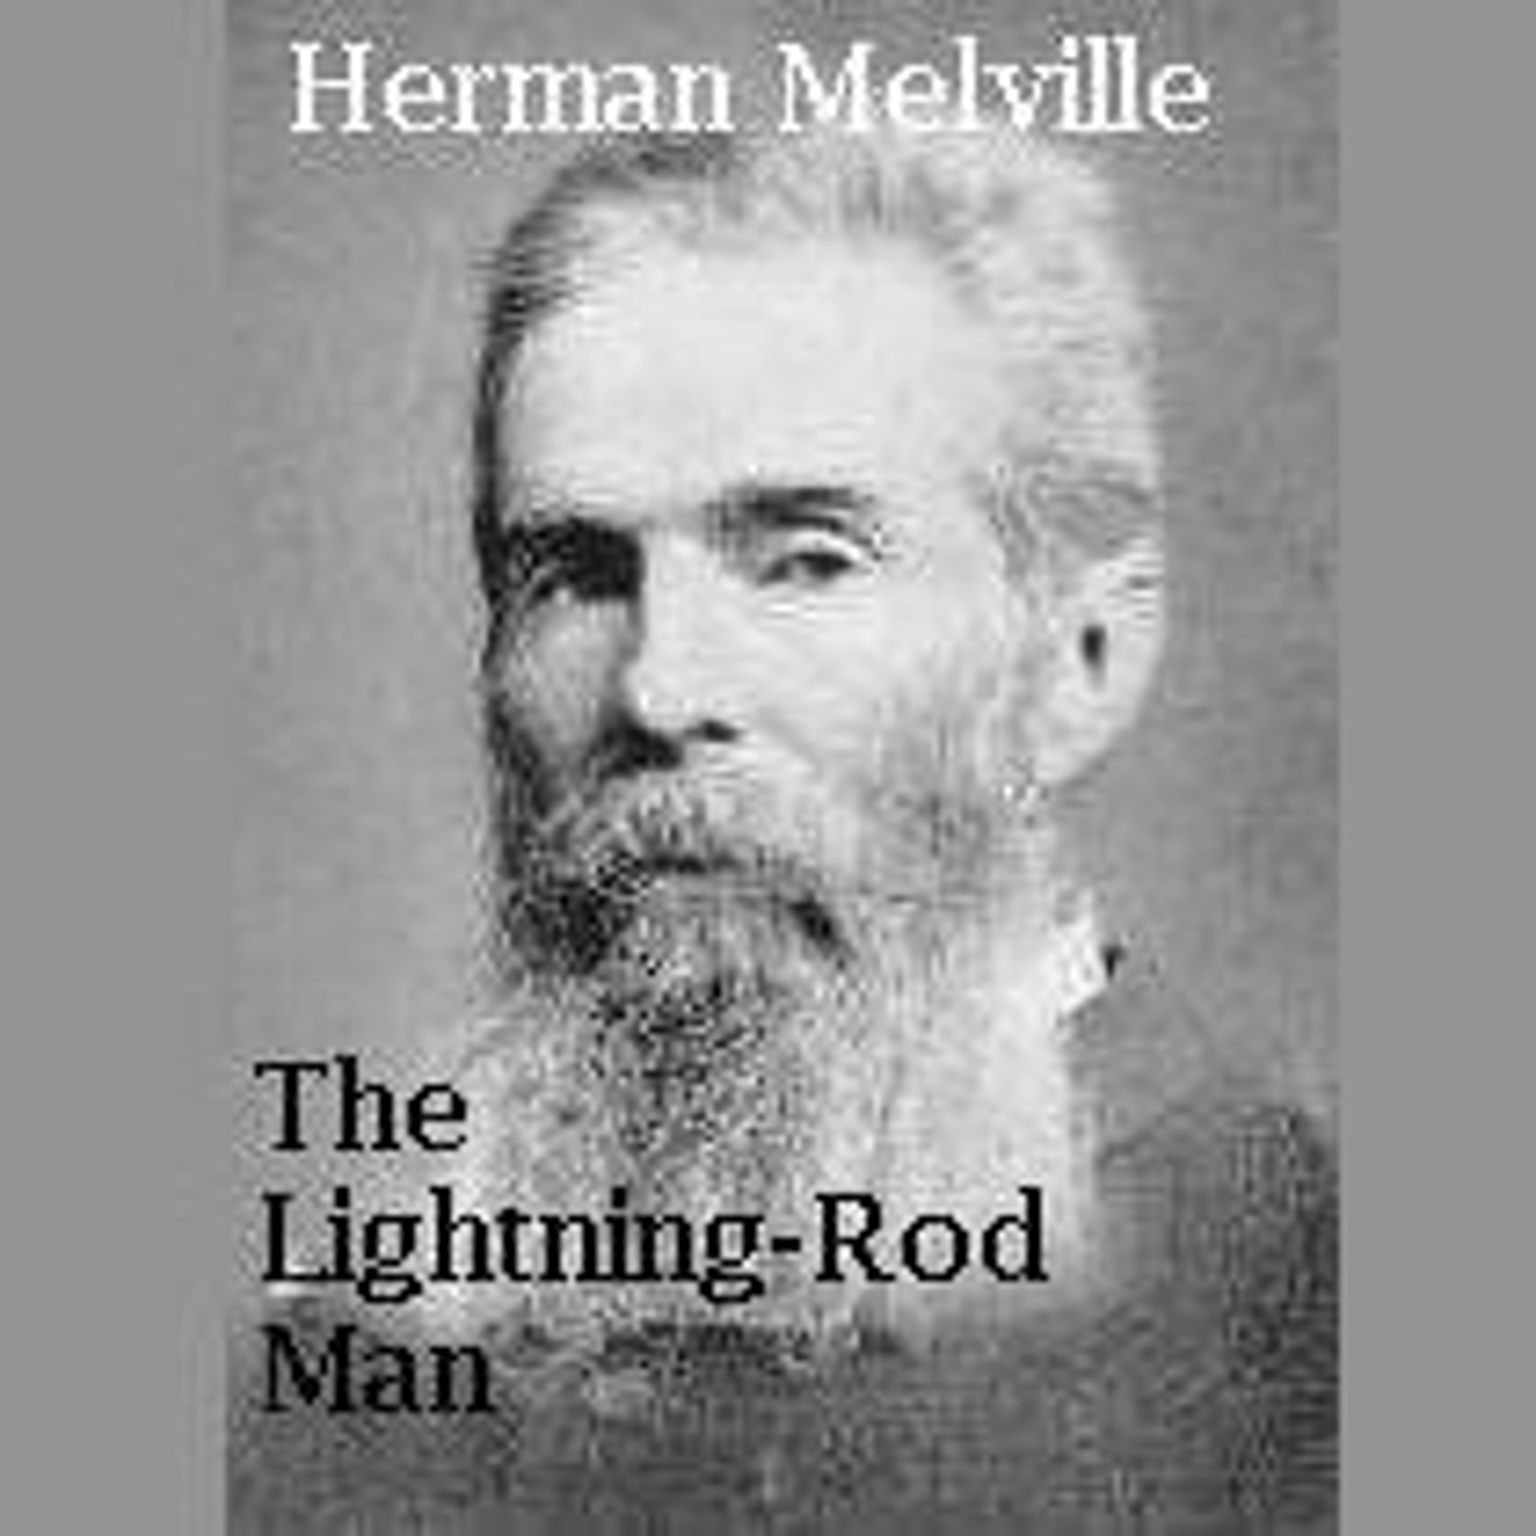 The Lightning-Rod Man Audiobook, by Herman Melville